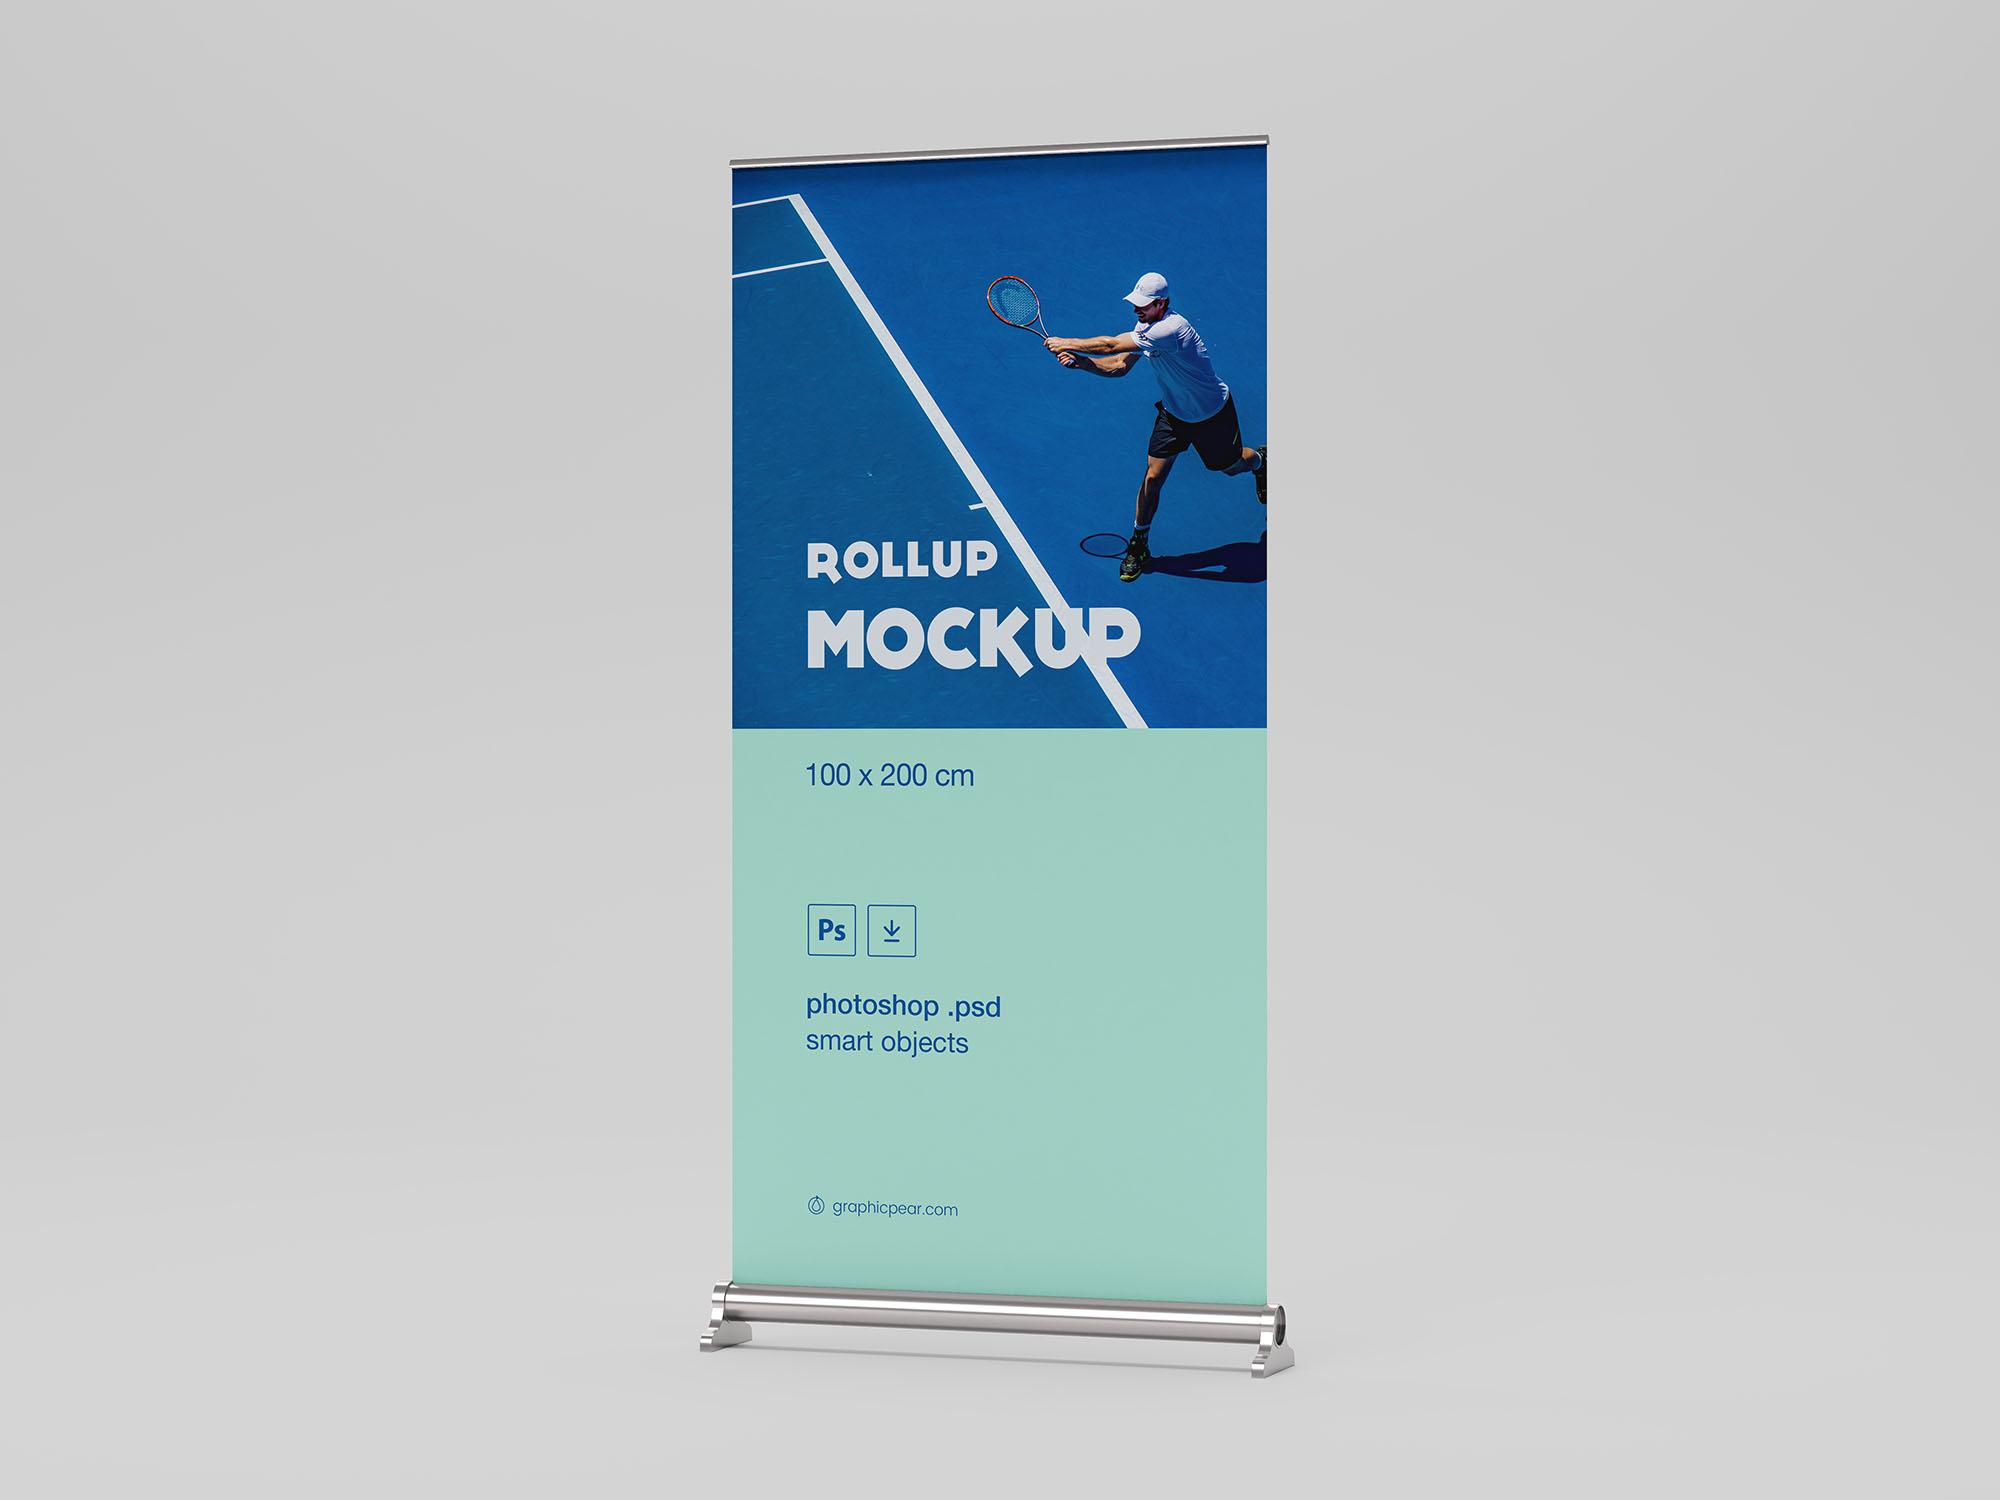 Free Rollup Mockup 100 x 200cm